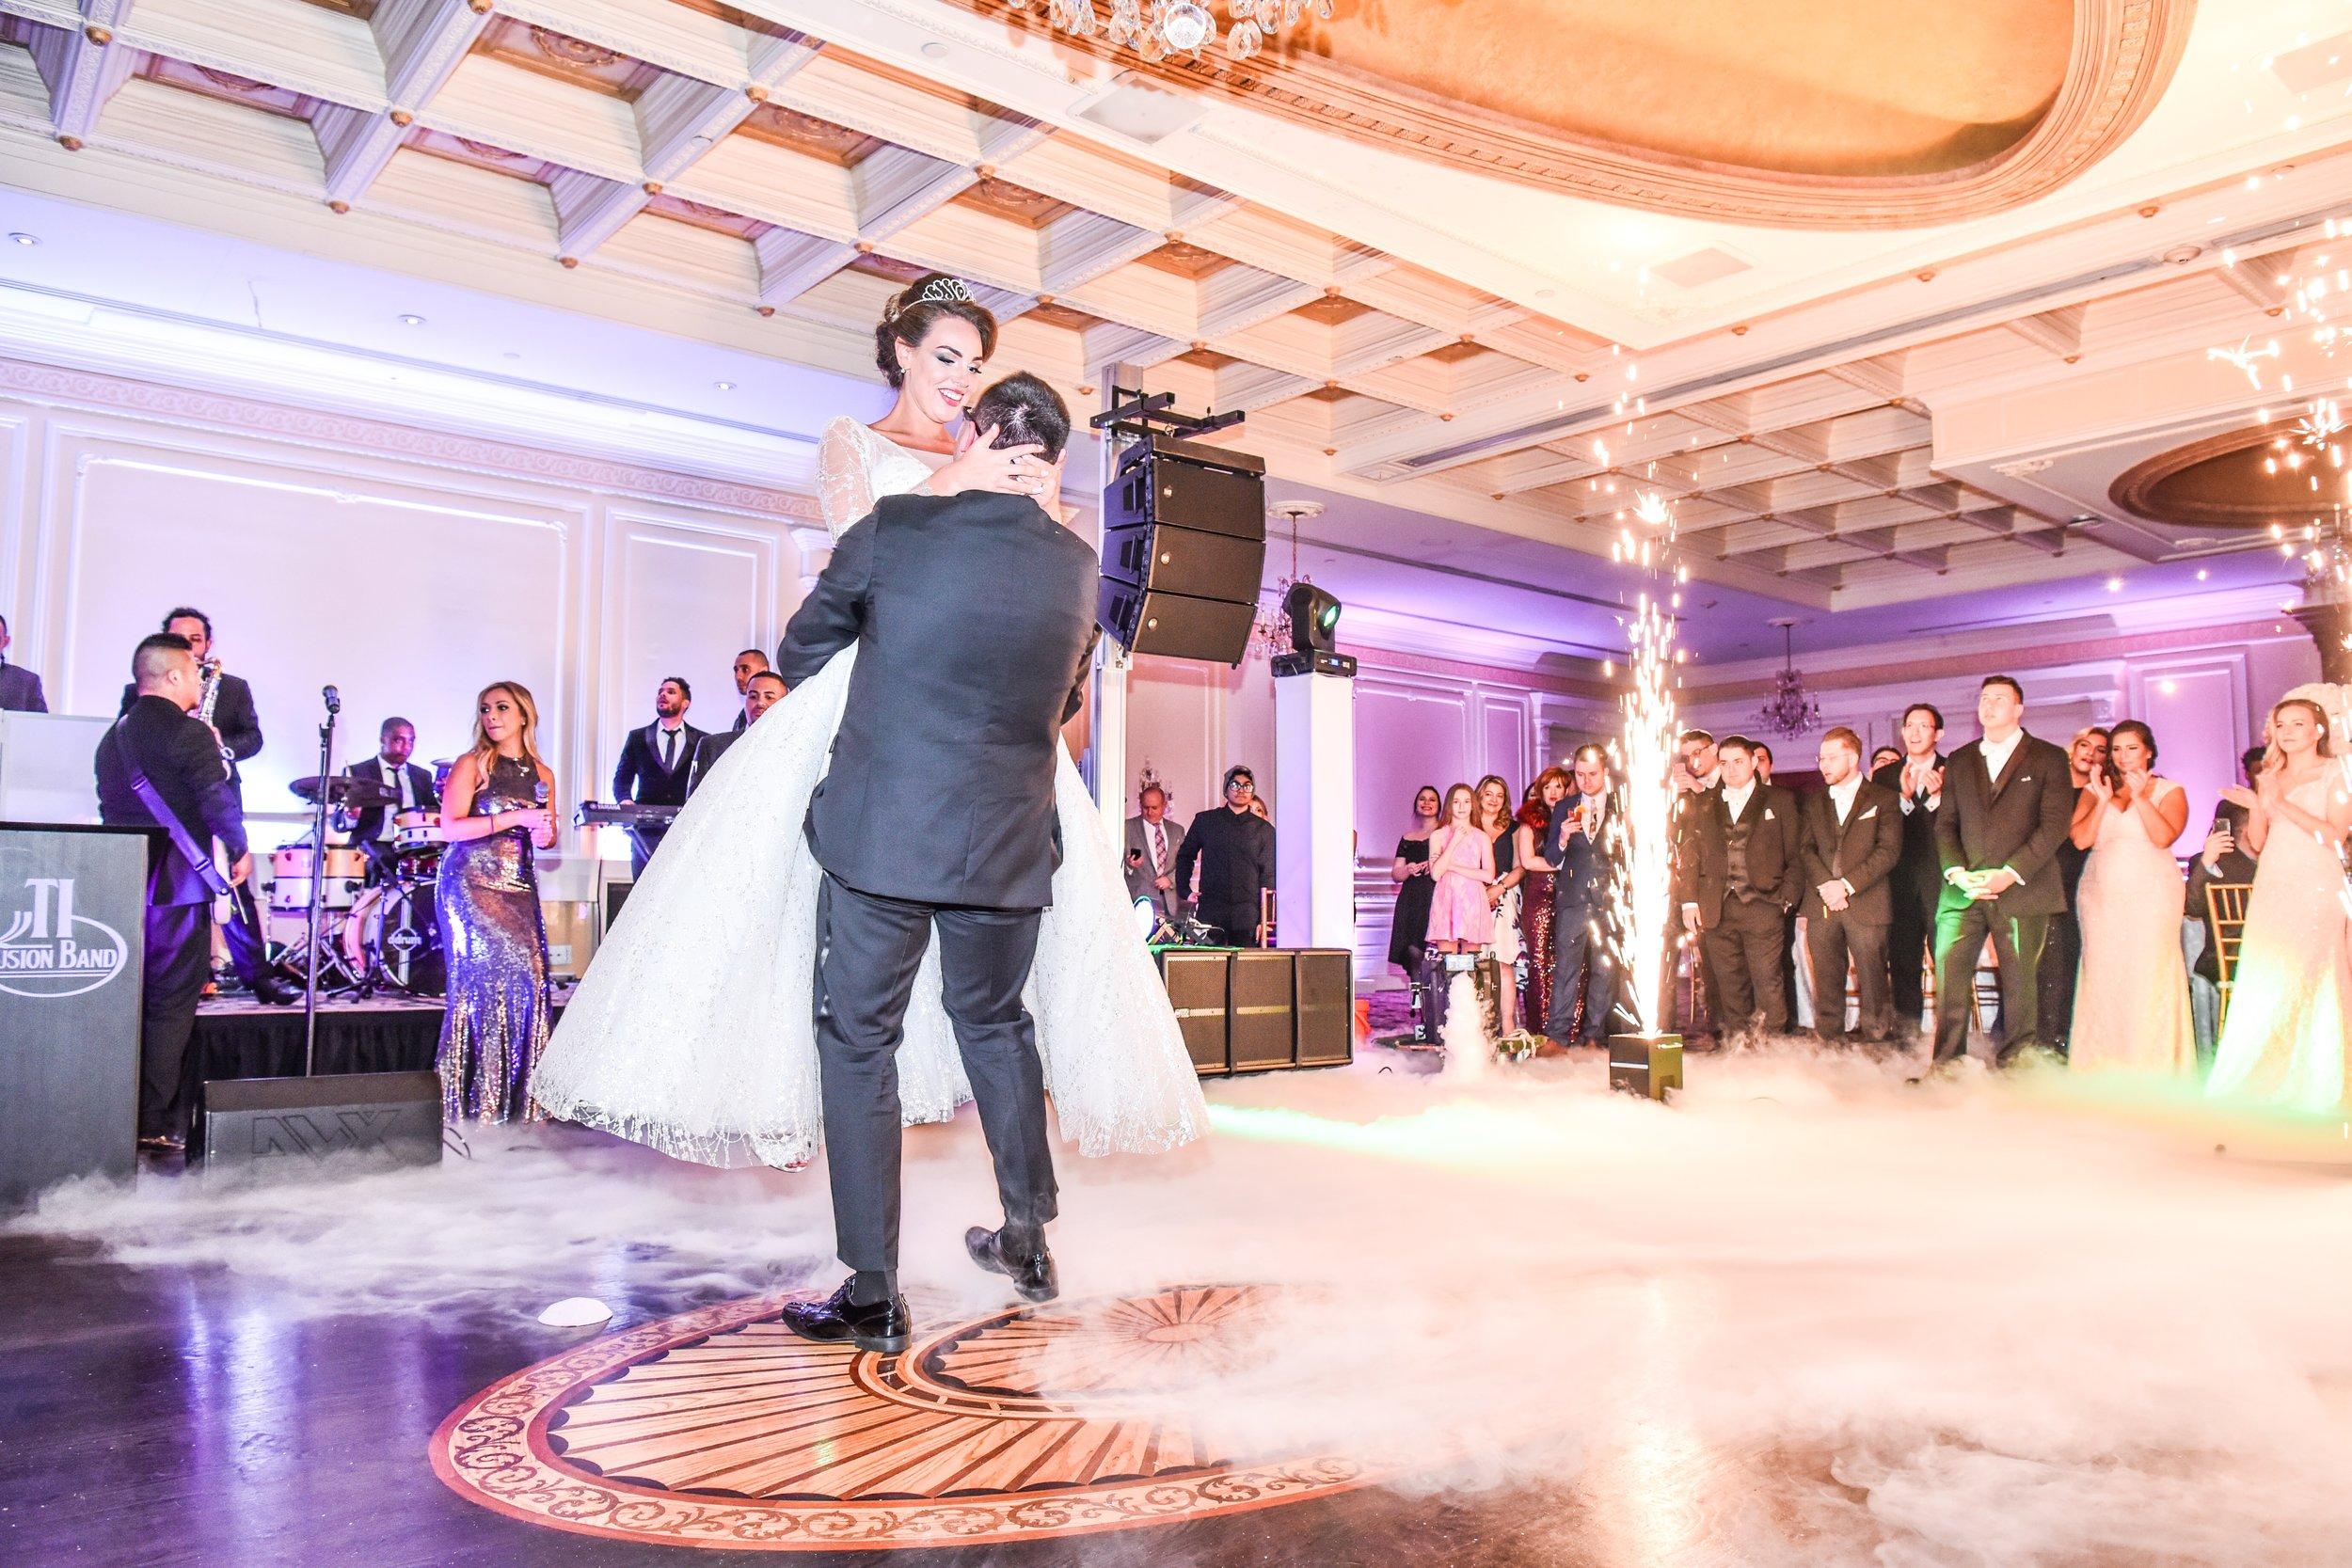 alex_edge_ti_fusion_ny_wedding_8.JPG